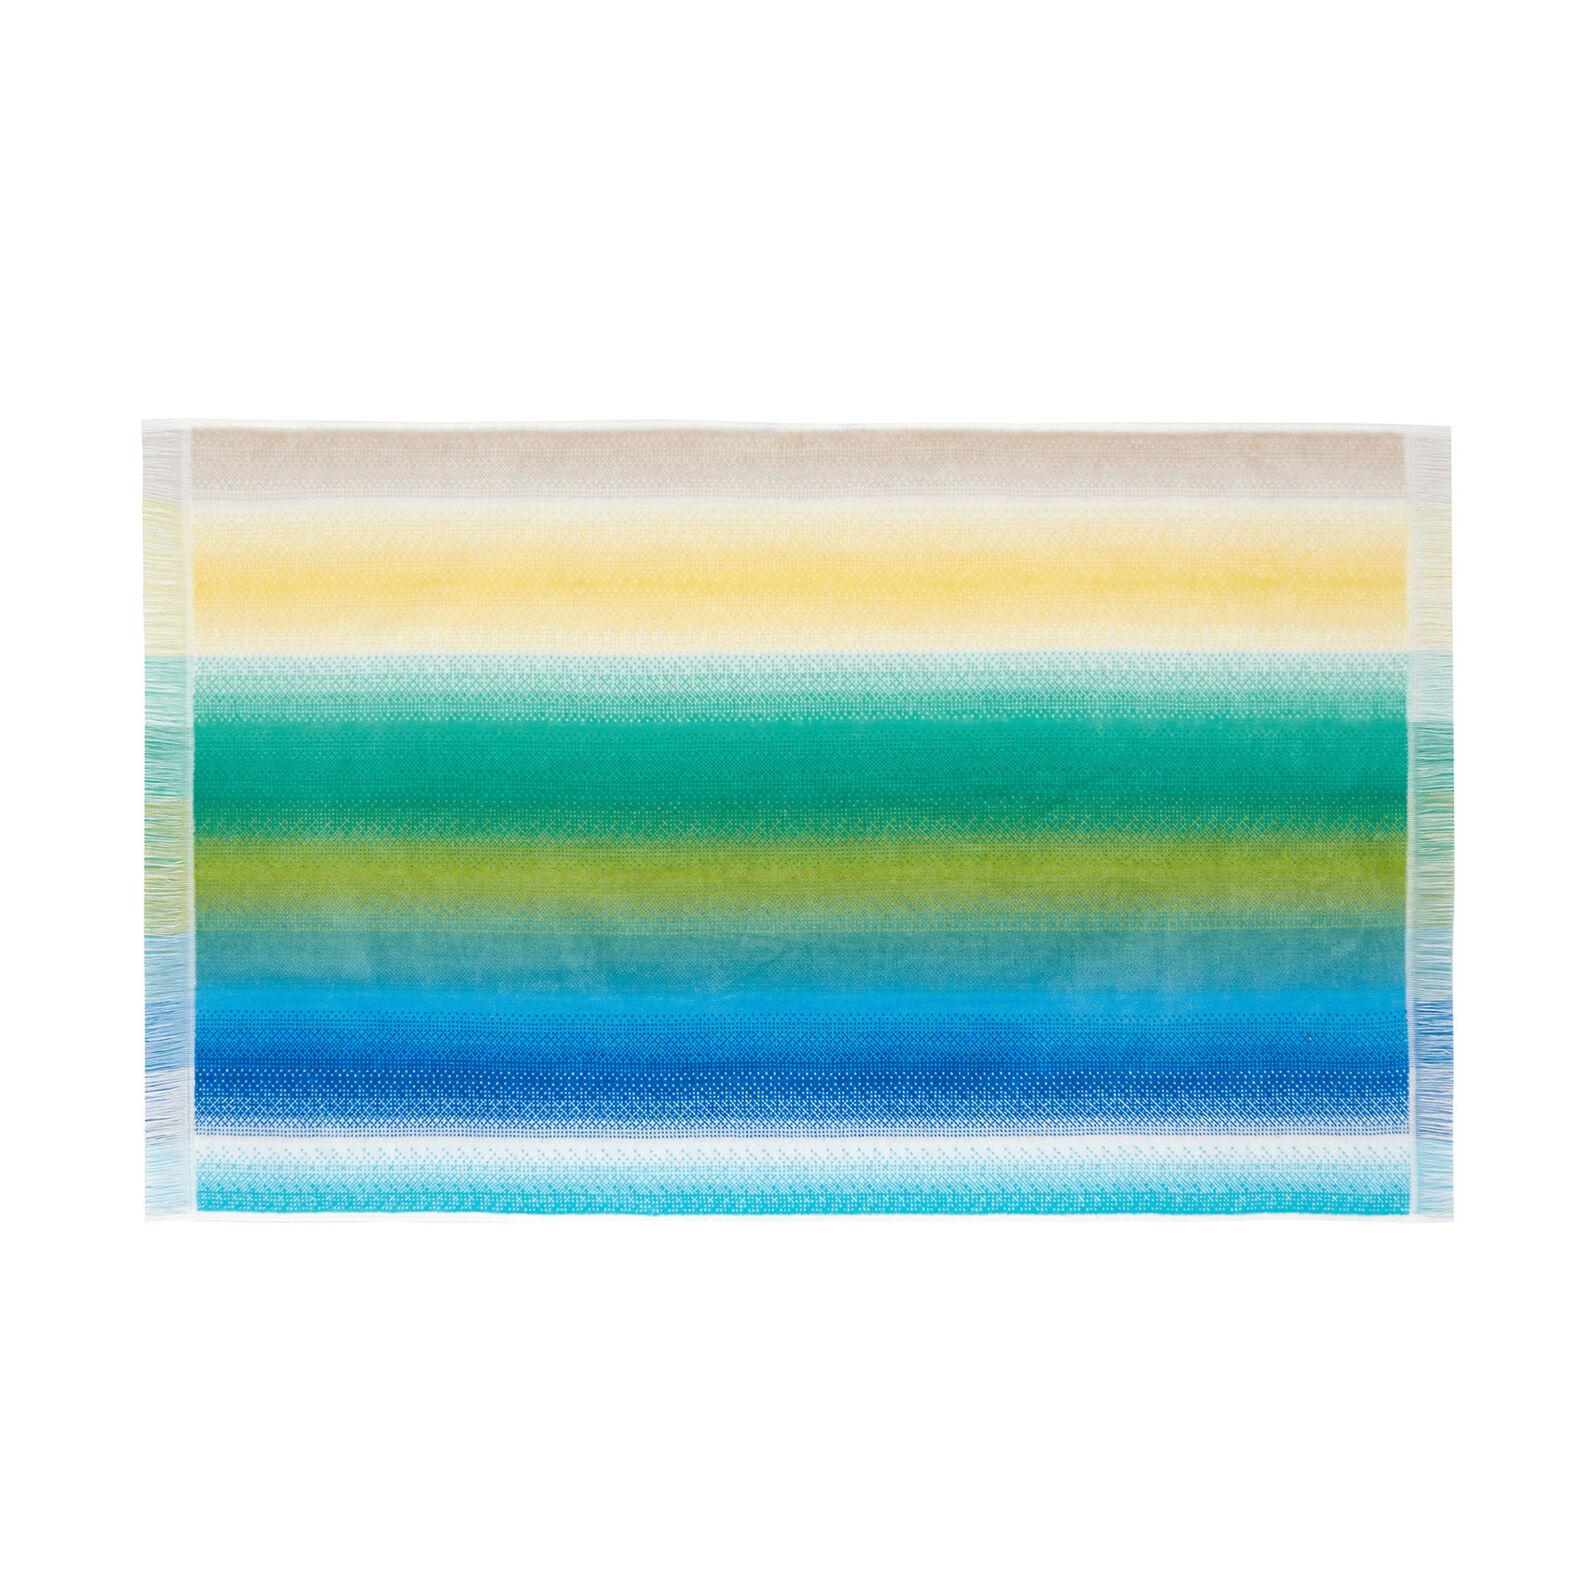 100% cotton velour towel with multi-coloured stripes